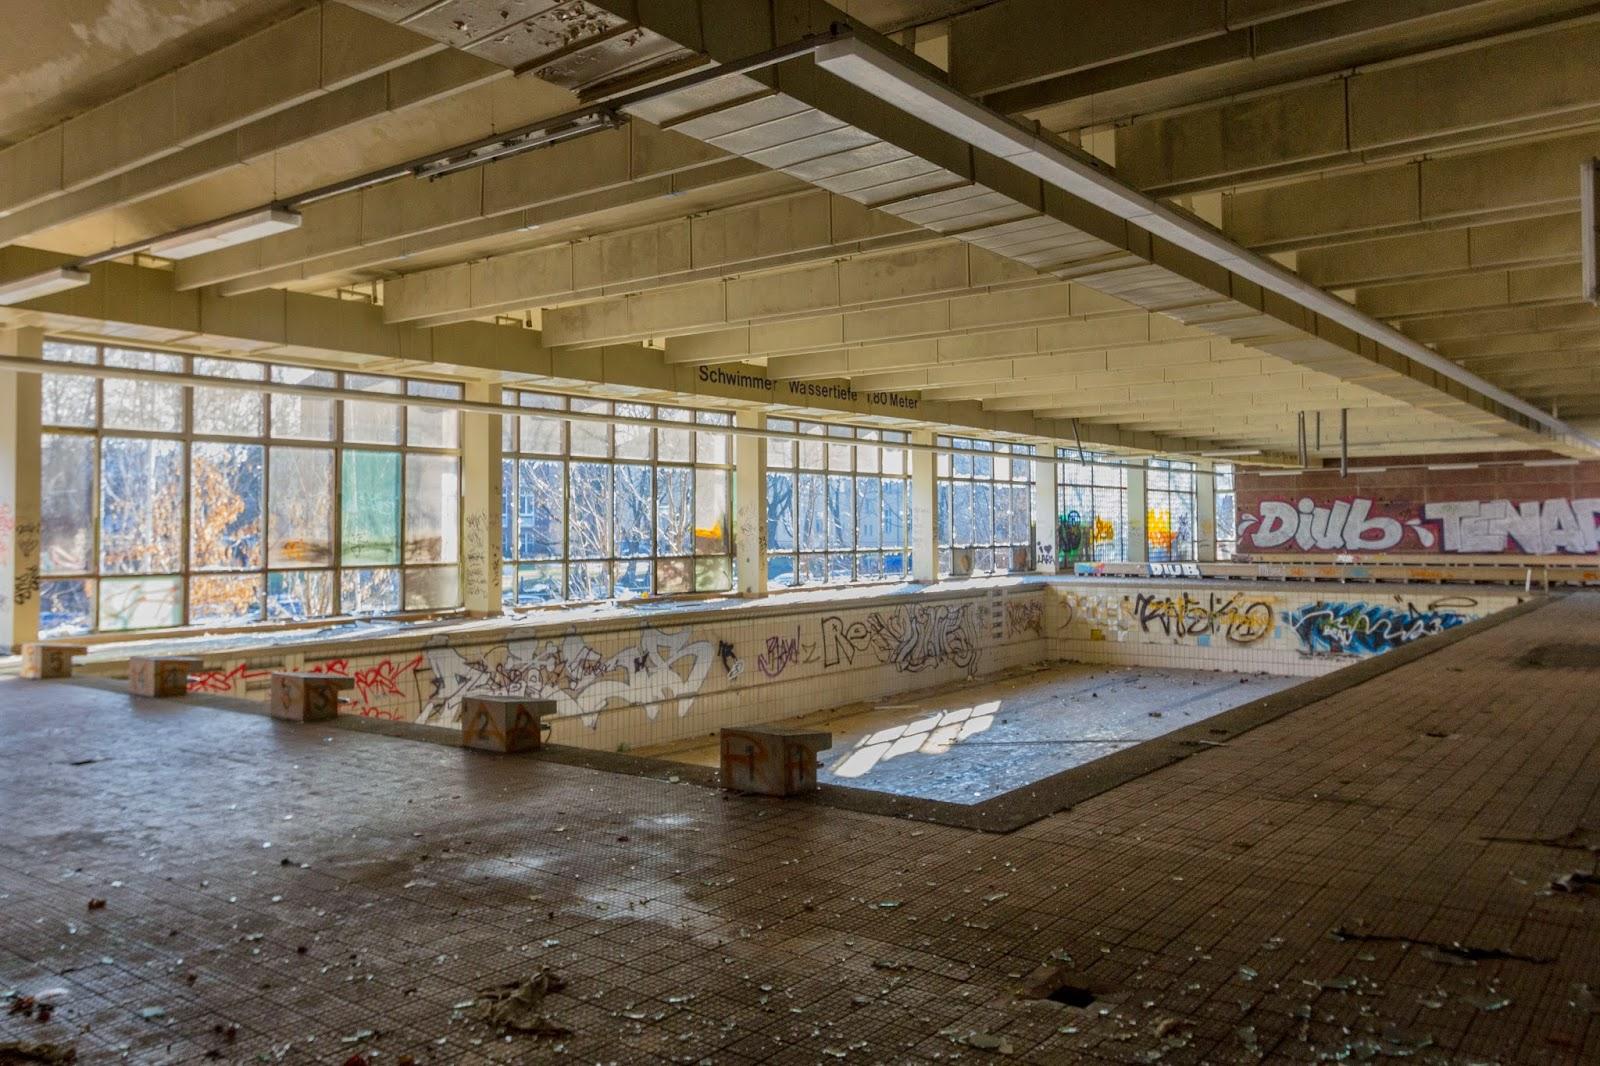 Last smash pankow schwimmhalle abandoned berlin - Indoor swimming pool berlin ...